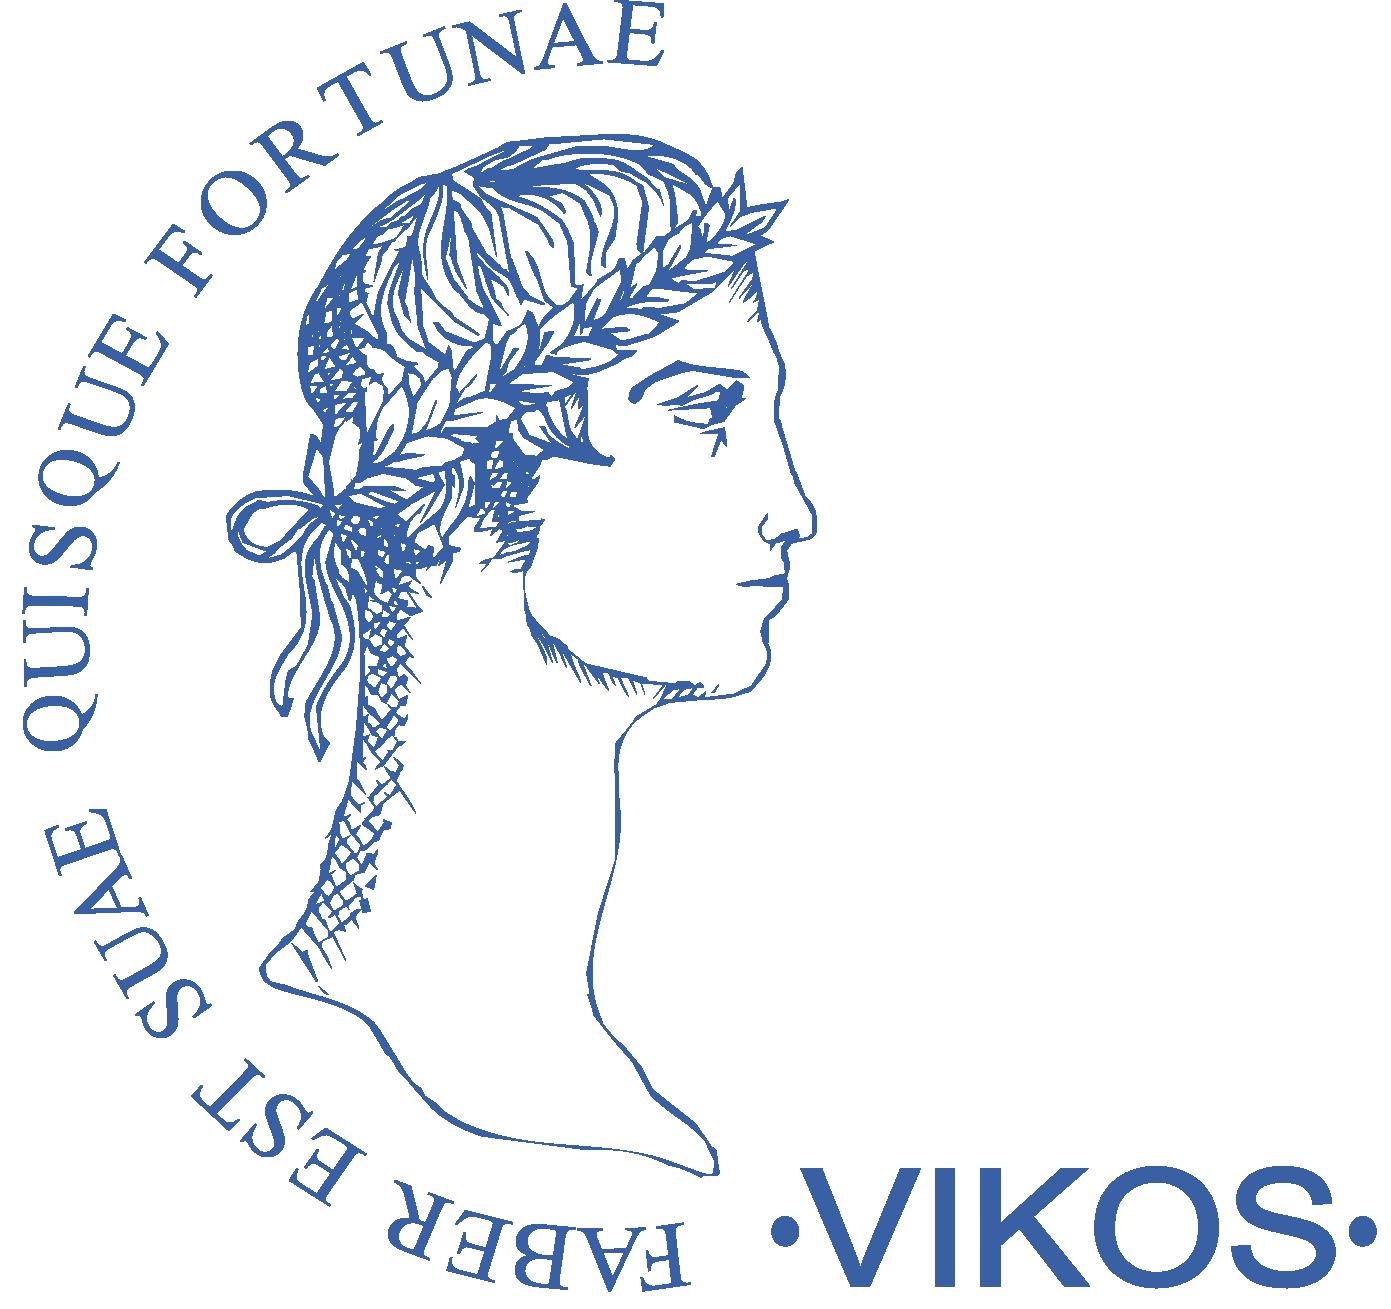 Vikos